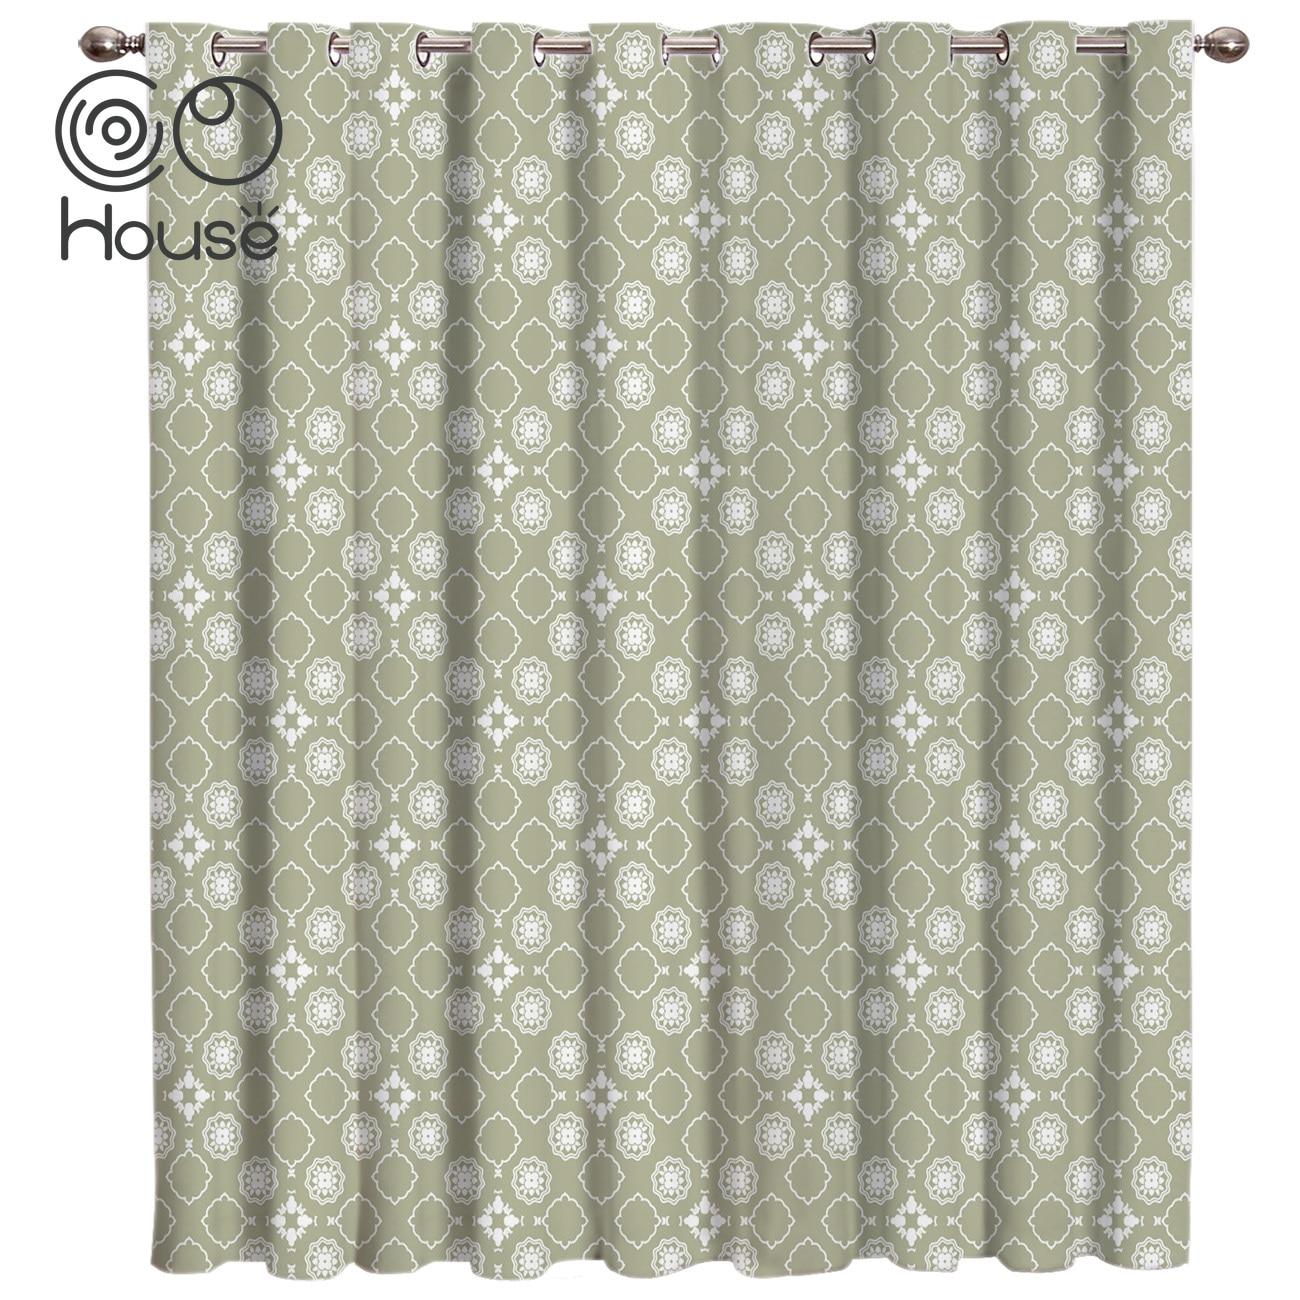 COCOHouse Bohemia Retro Ethnic Green Window Treatments Curtains Valance Living Room Outdoor Bedroom Indoor Fabric Decor